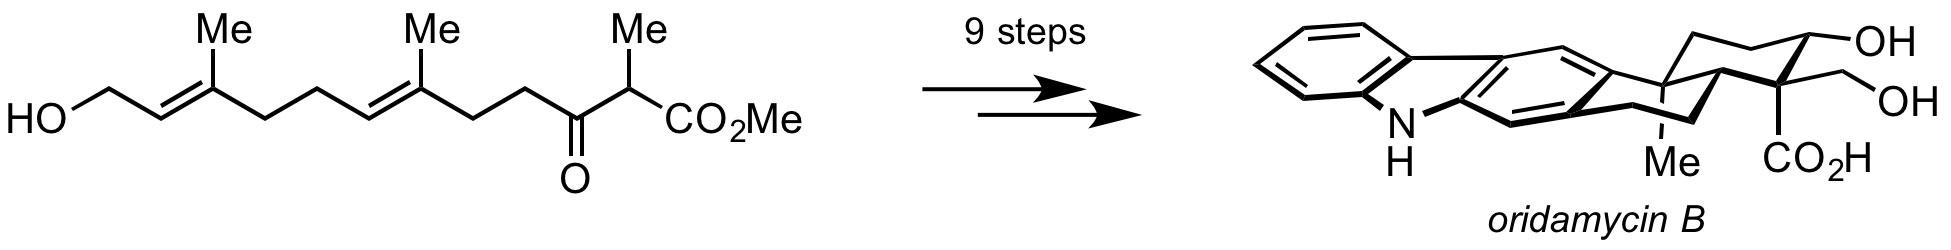 oridamycin graphical abstract